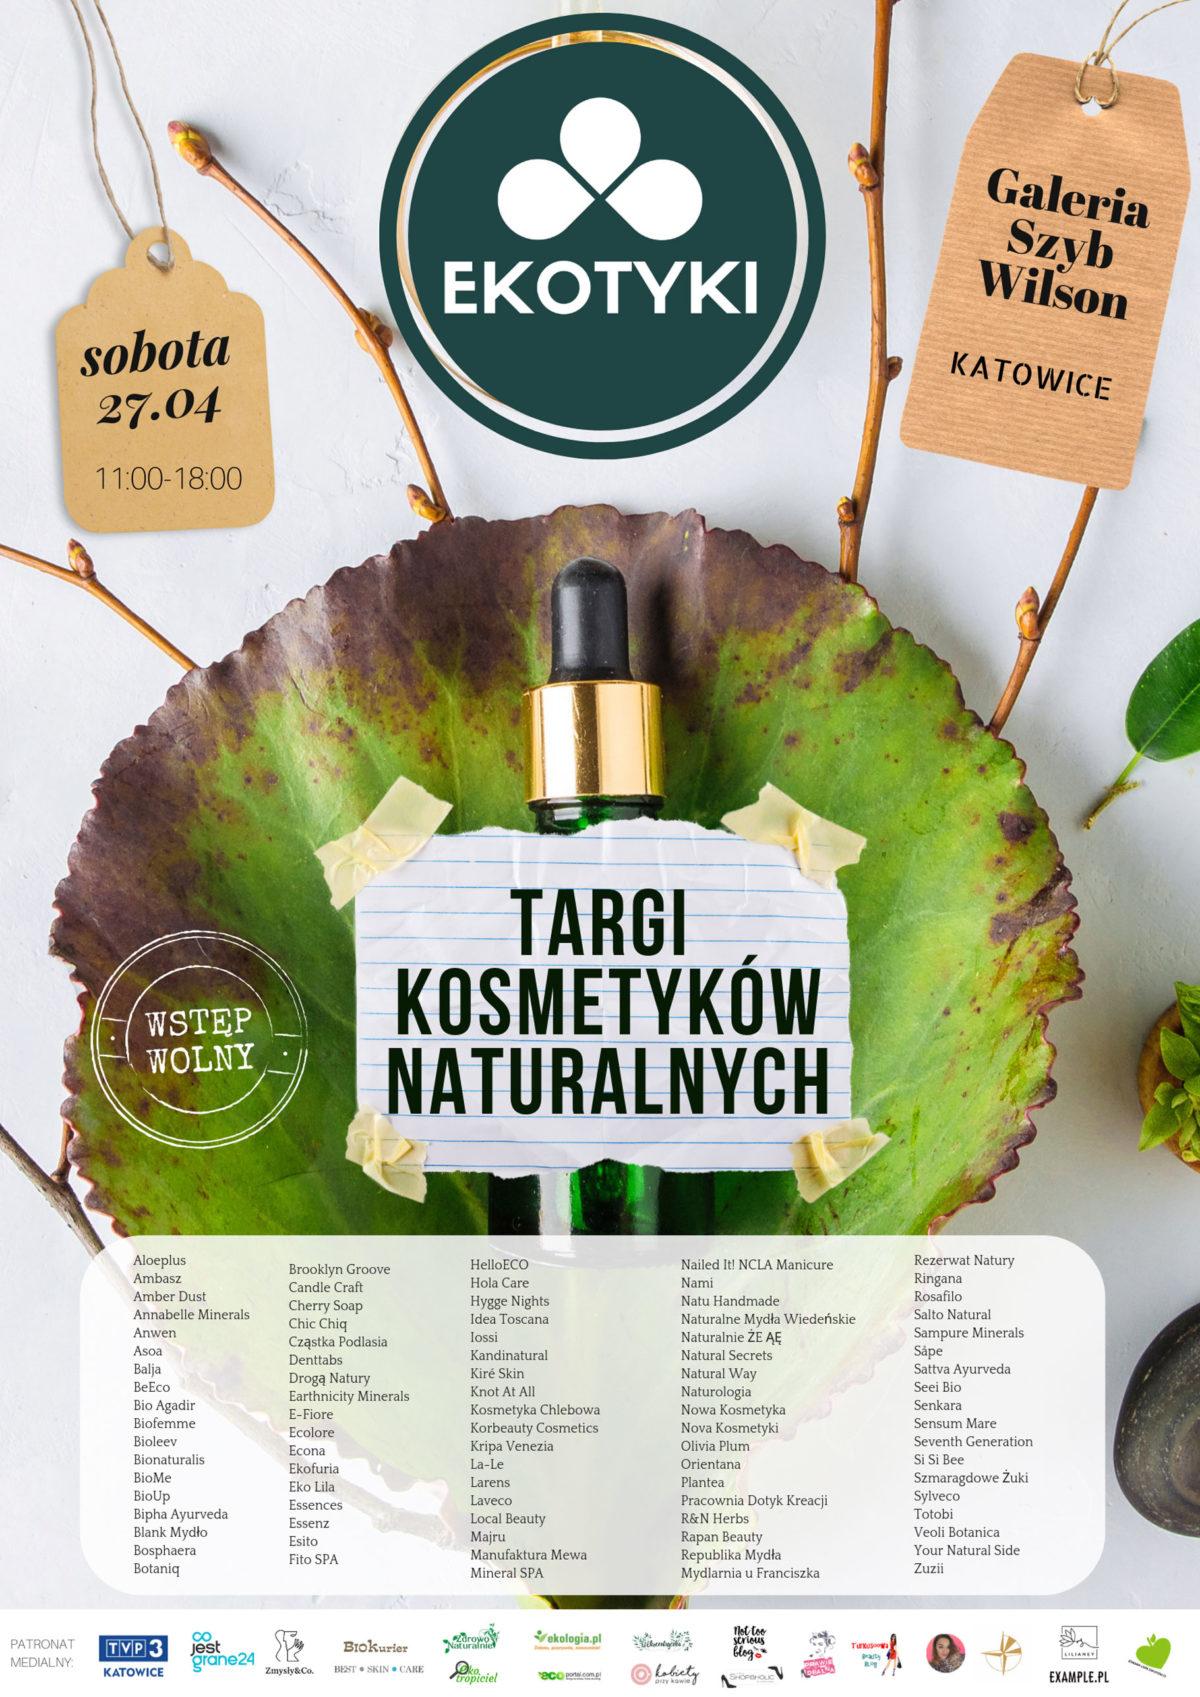 Ekotyki Katowice 27.04 – wystawcy